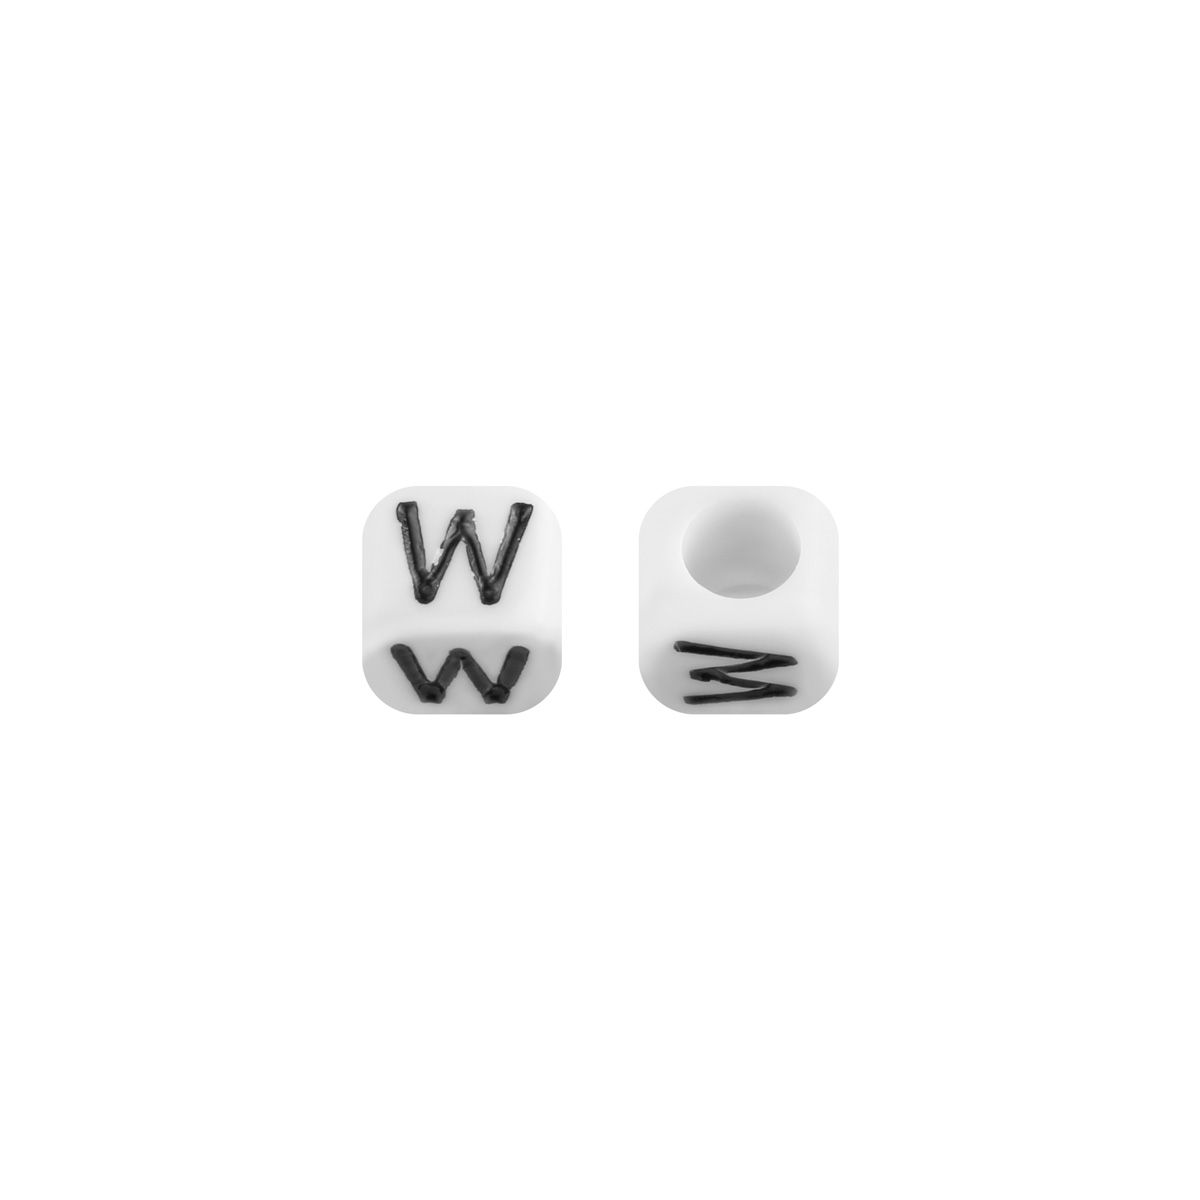 Cuentas DIY Letter W - 6MM